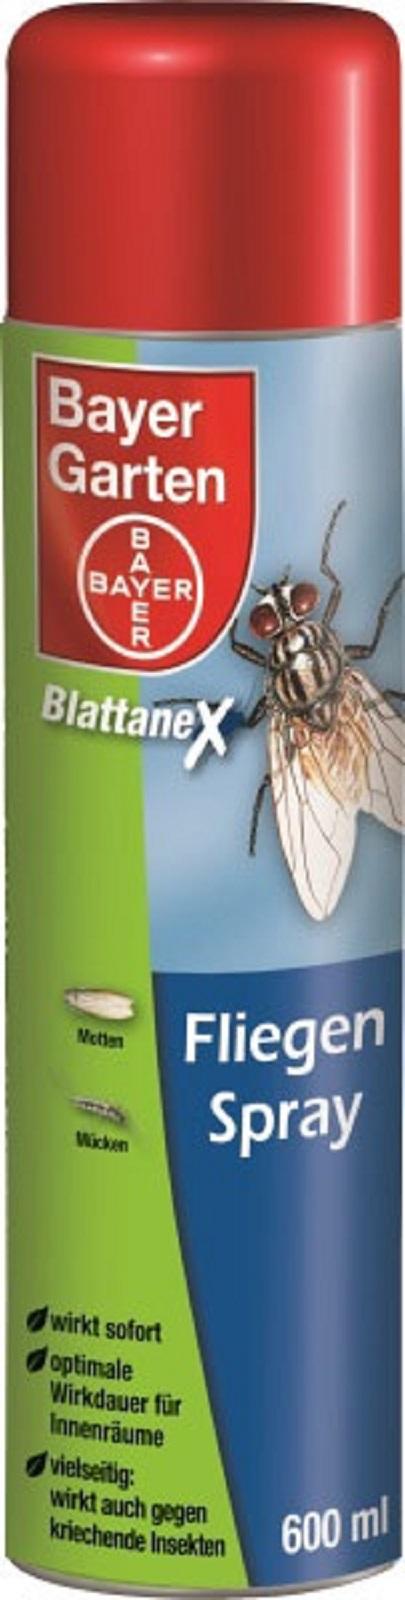 Bayer Fliegenspray 600 ml